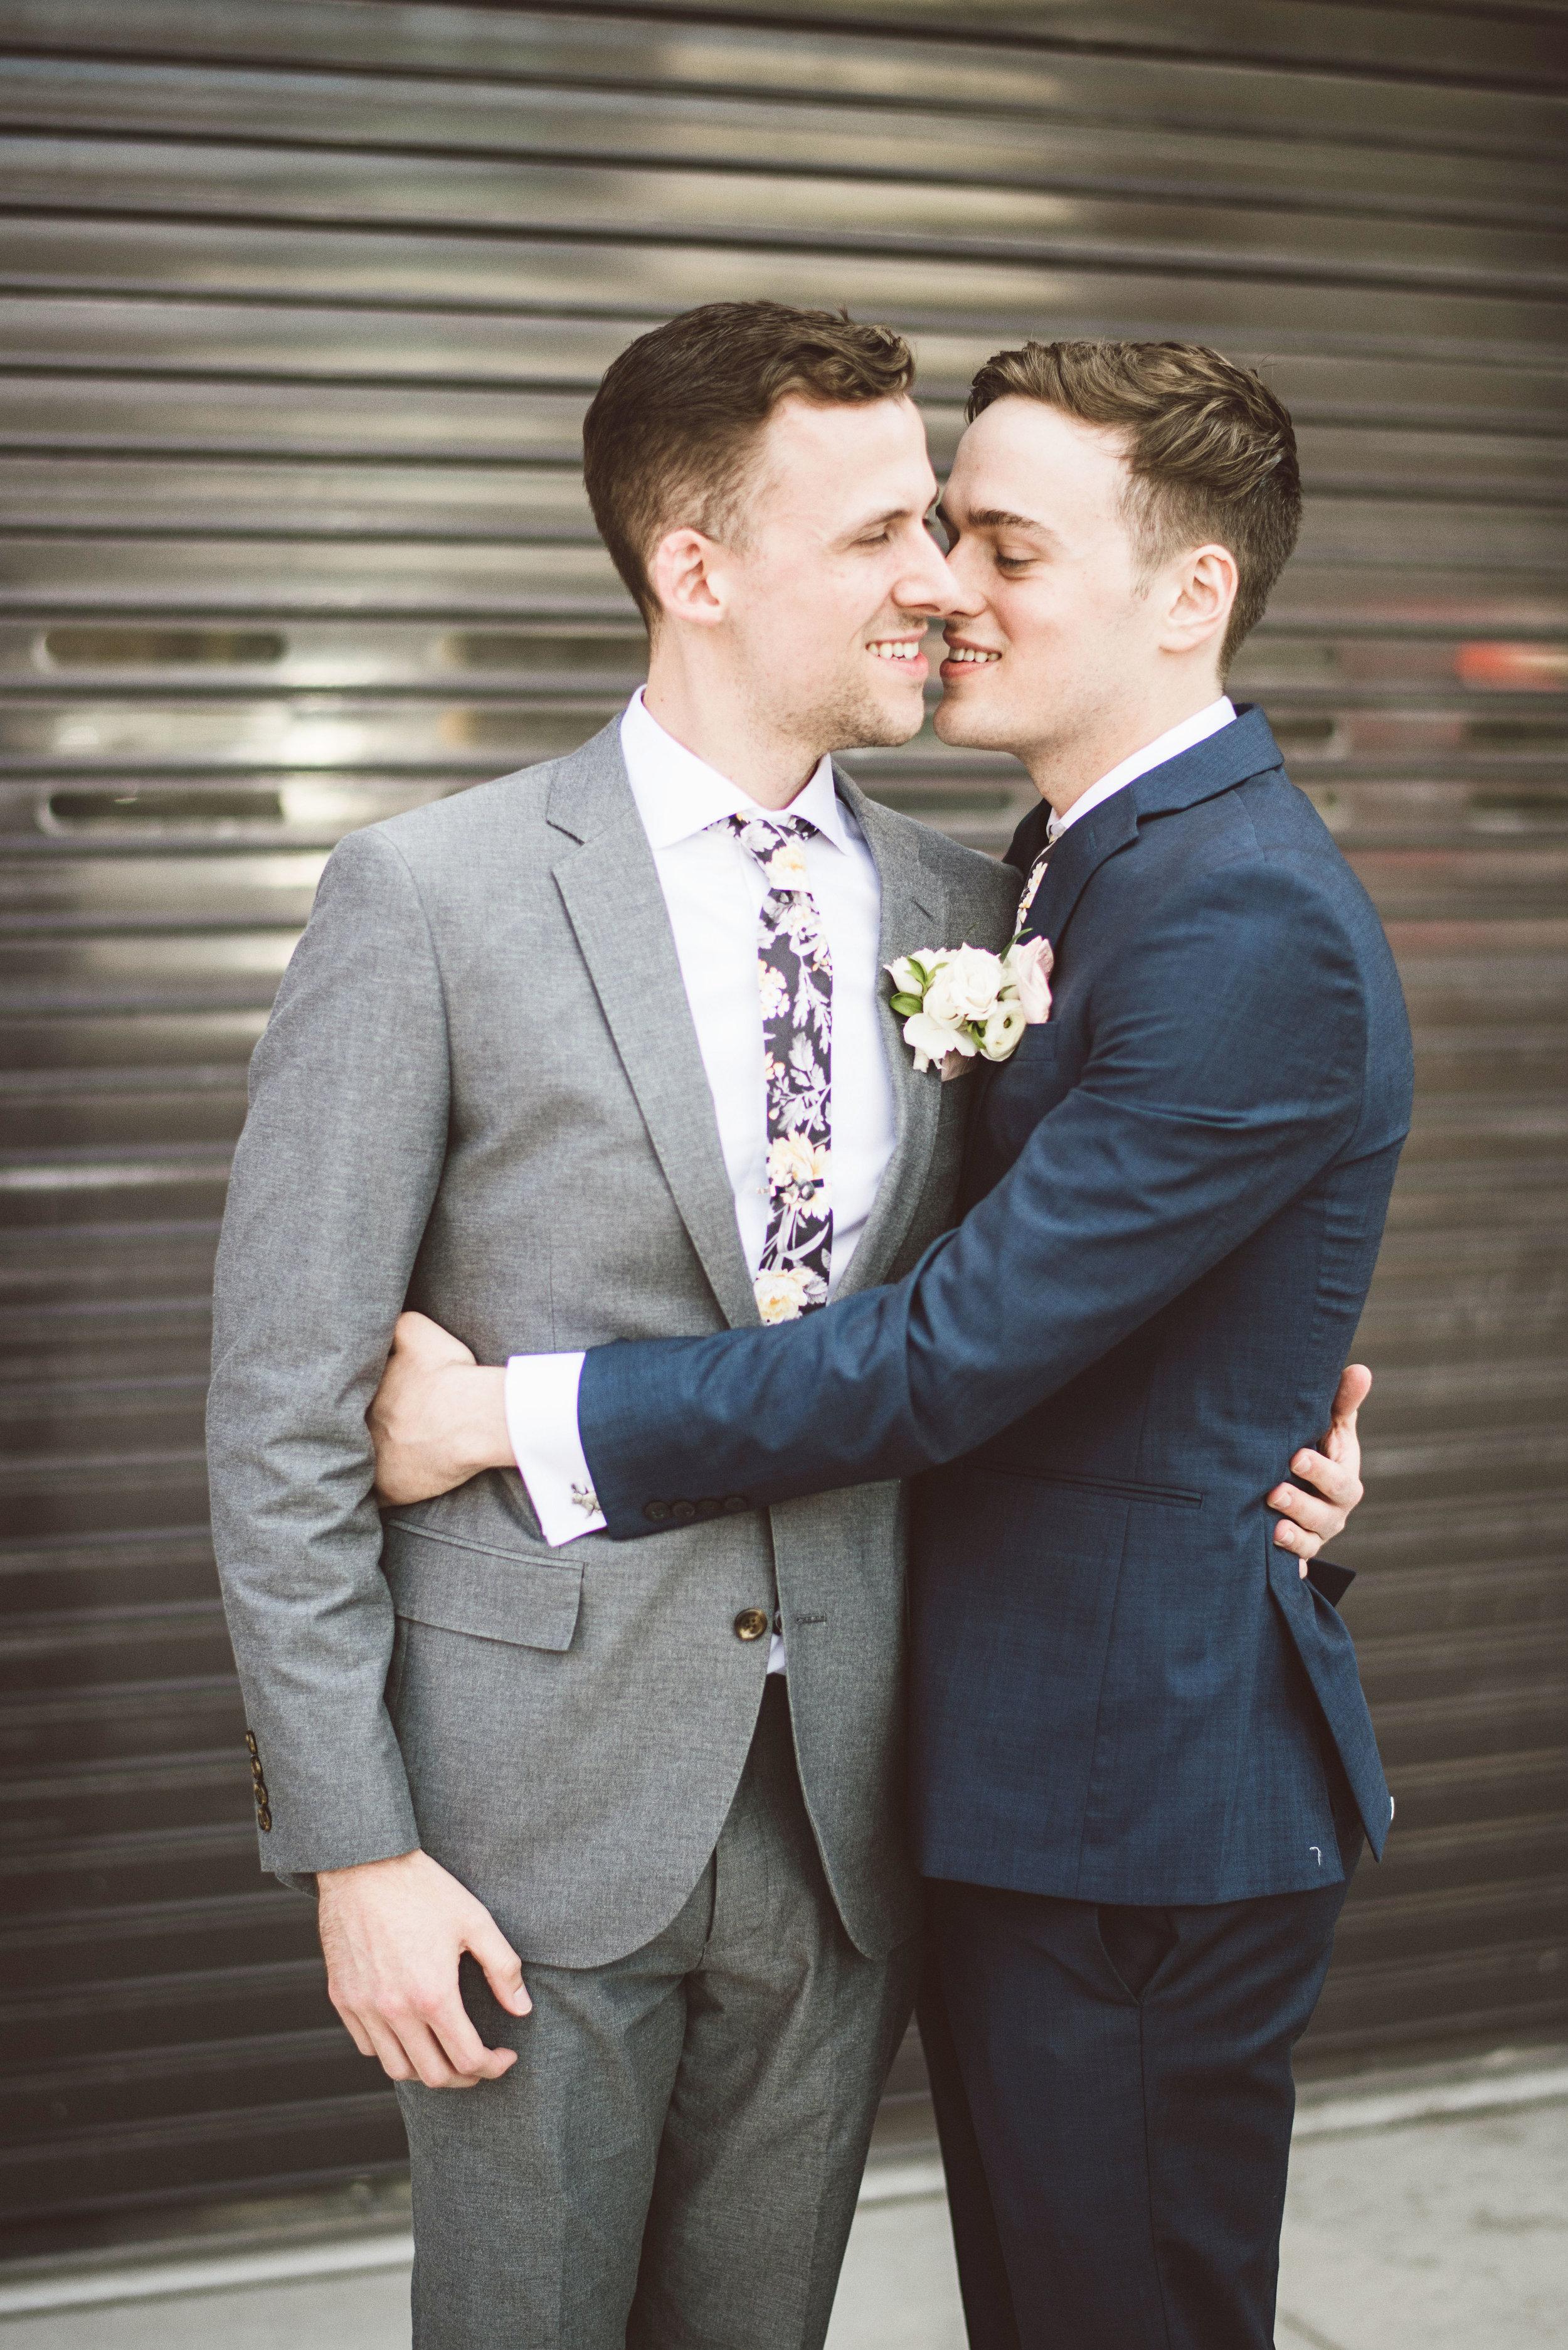 eric_derek_wedding_by_lucas_botz_photography_DSC_0310.jpg